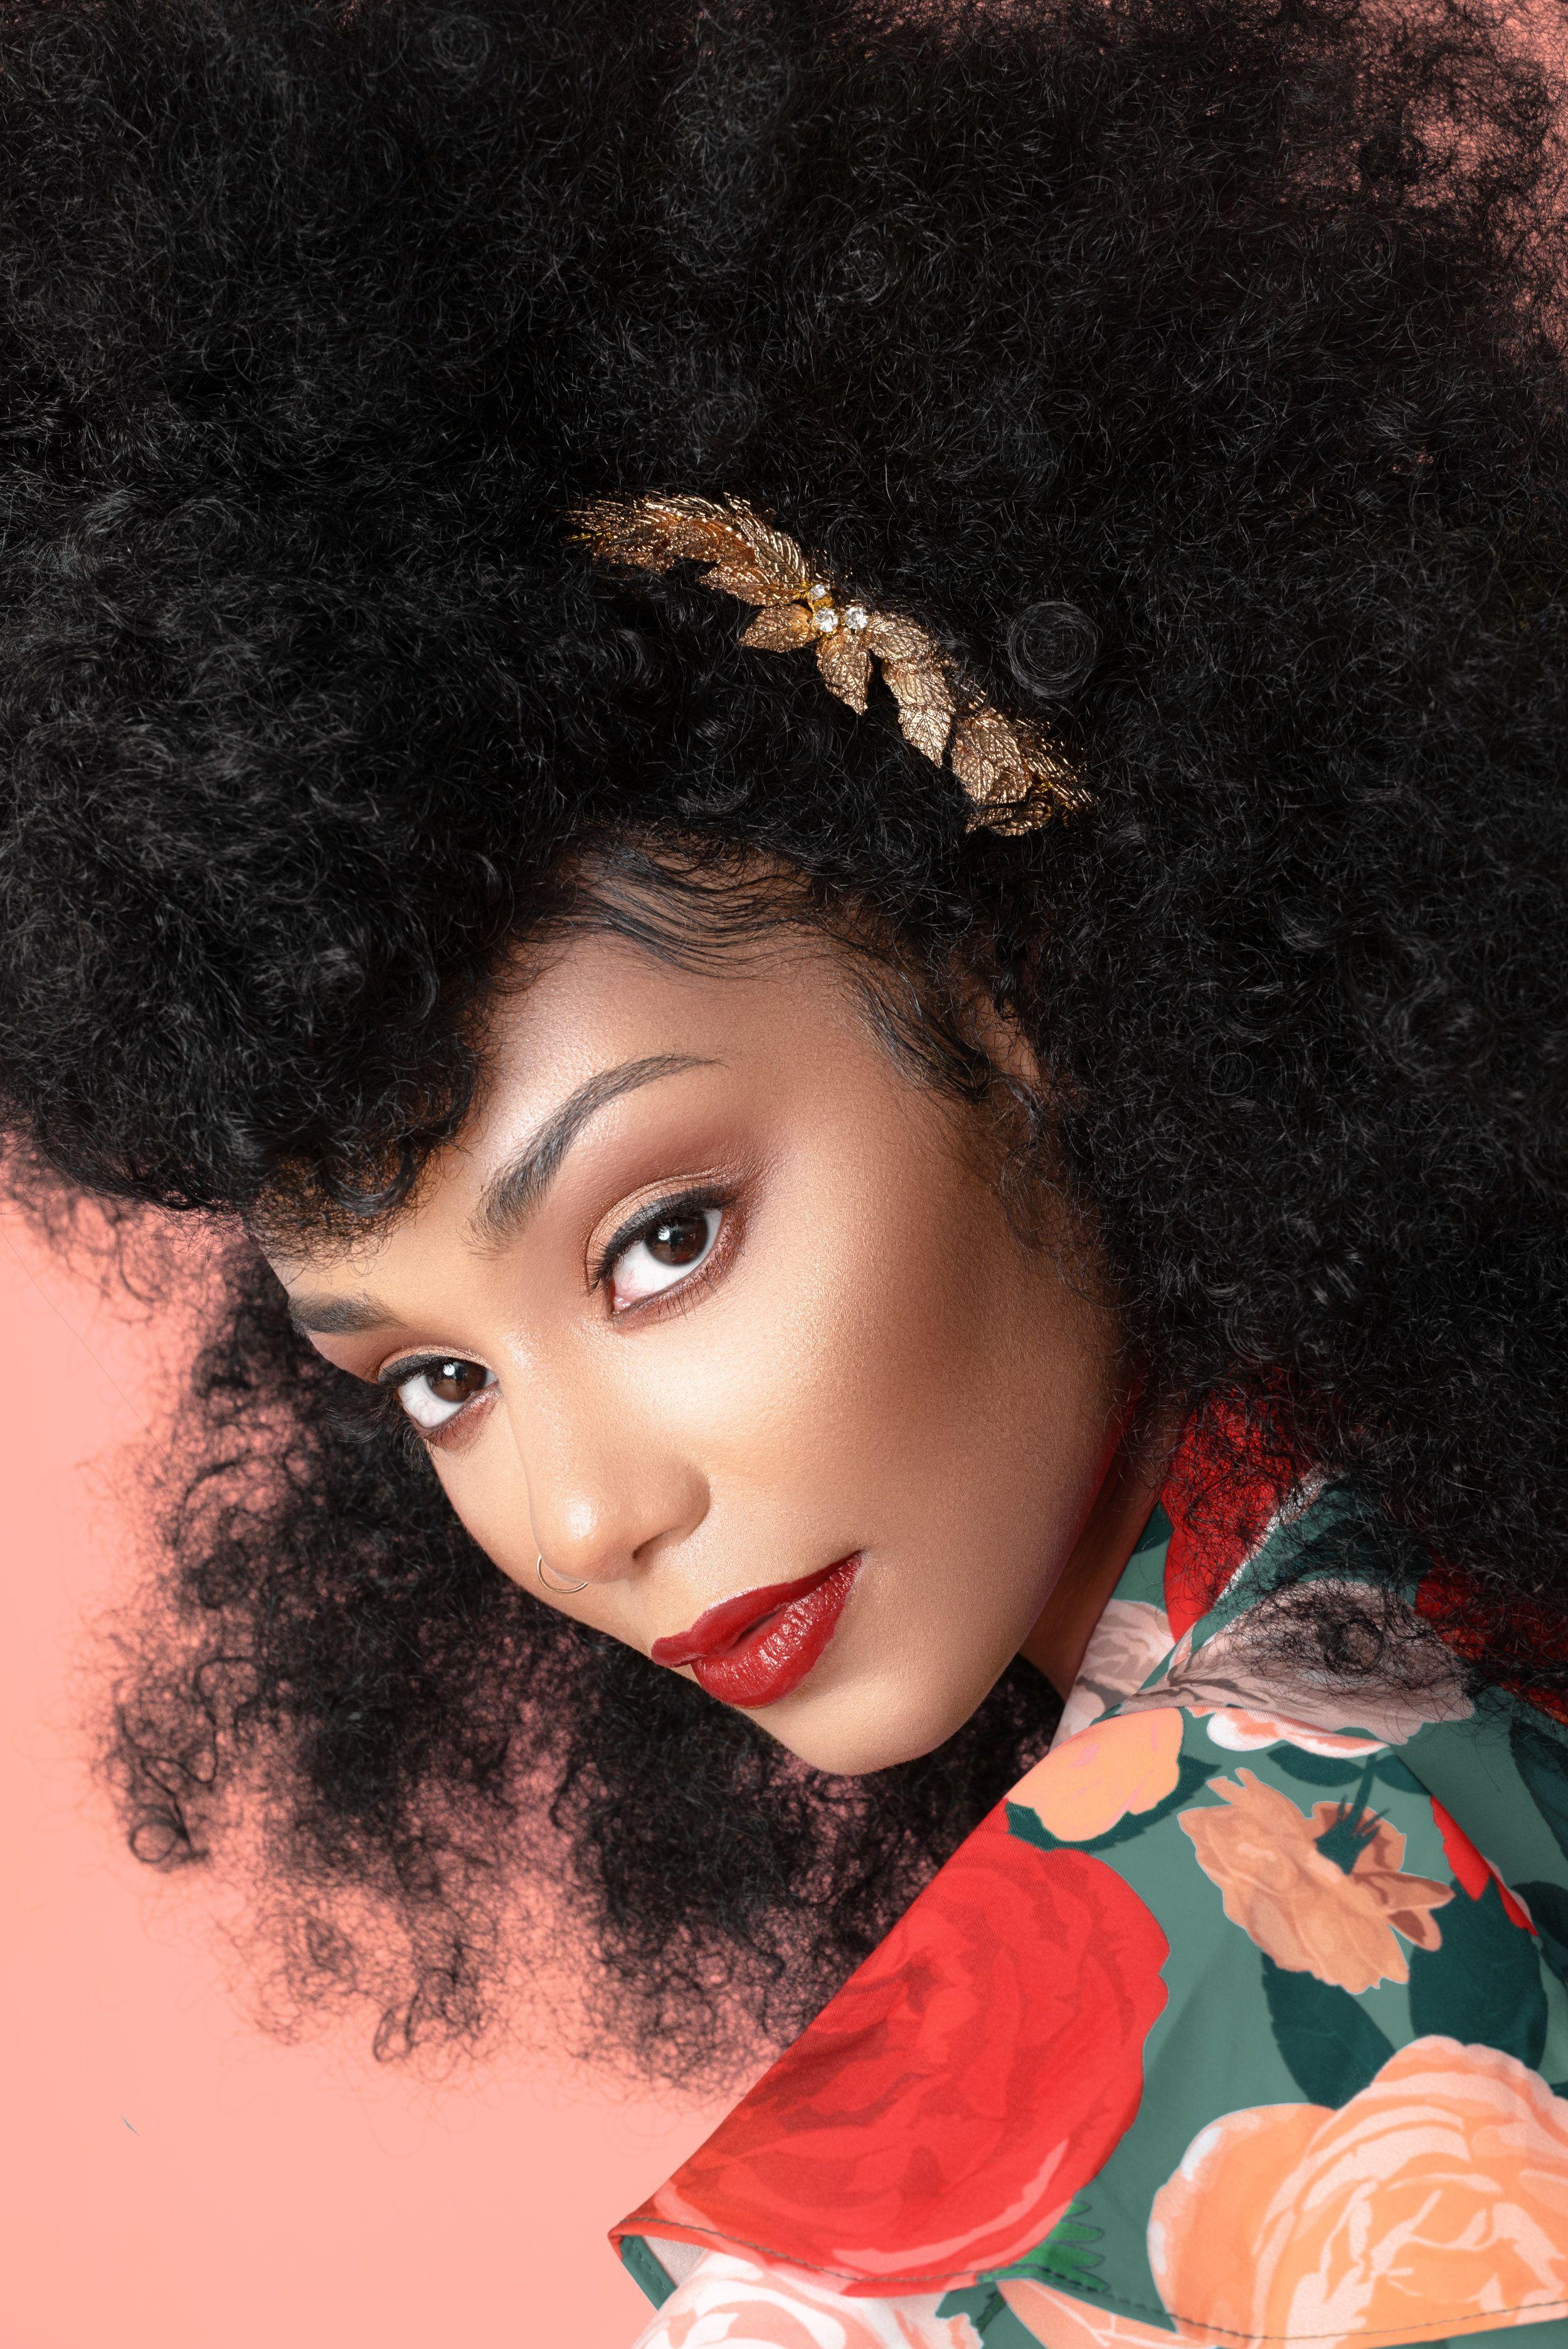 _75028541.jpg Natural hair styles, Coiling natural hair